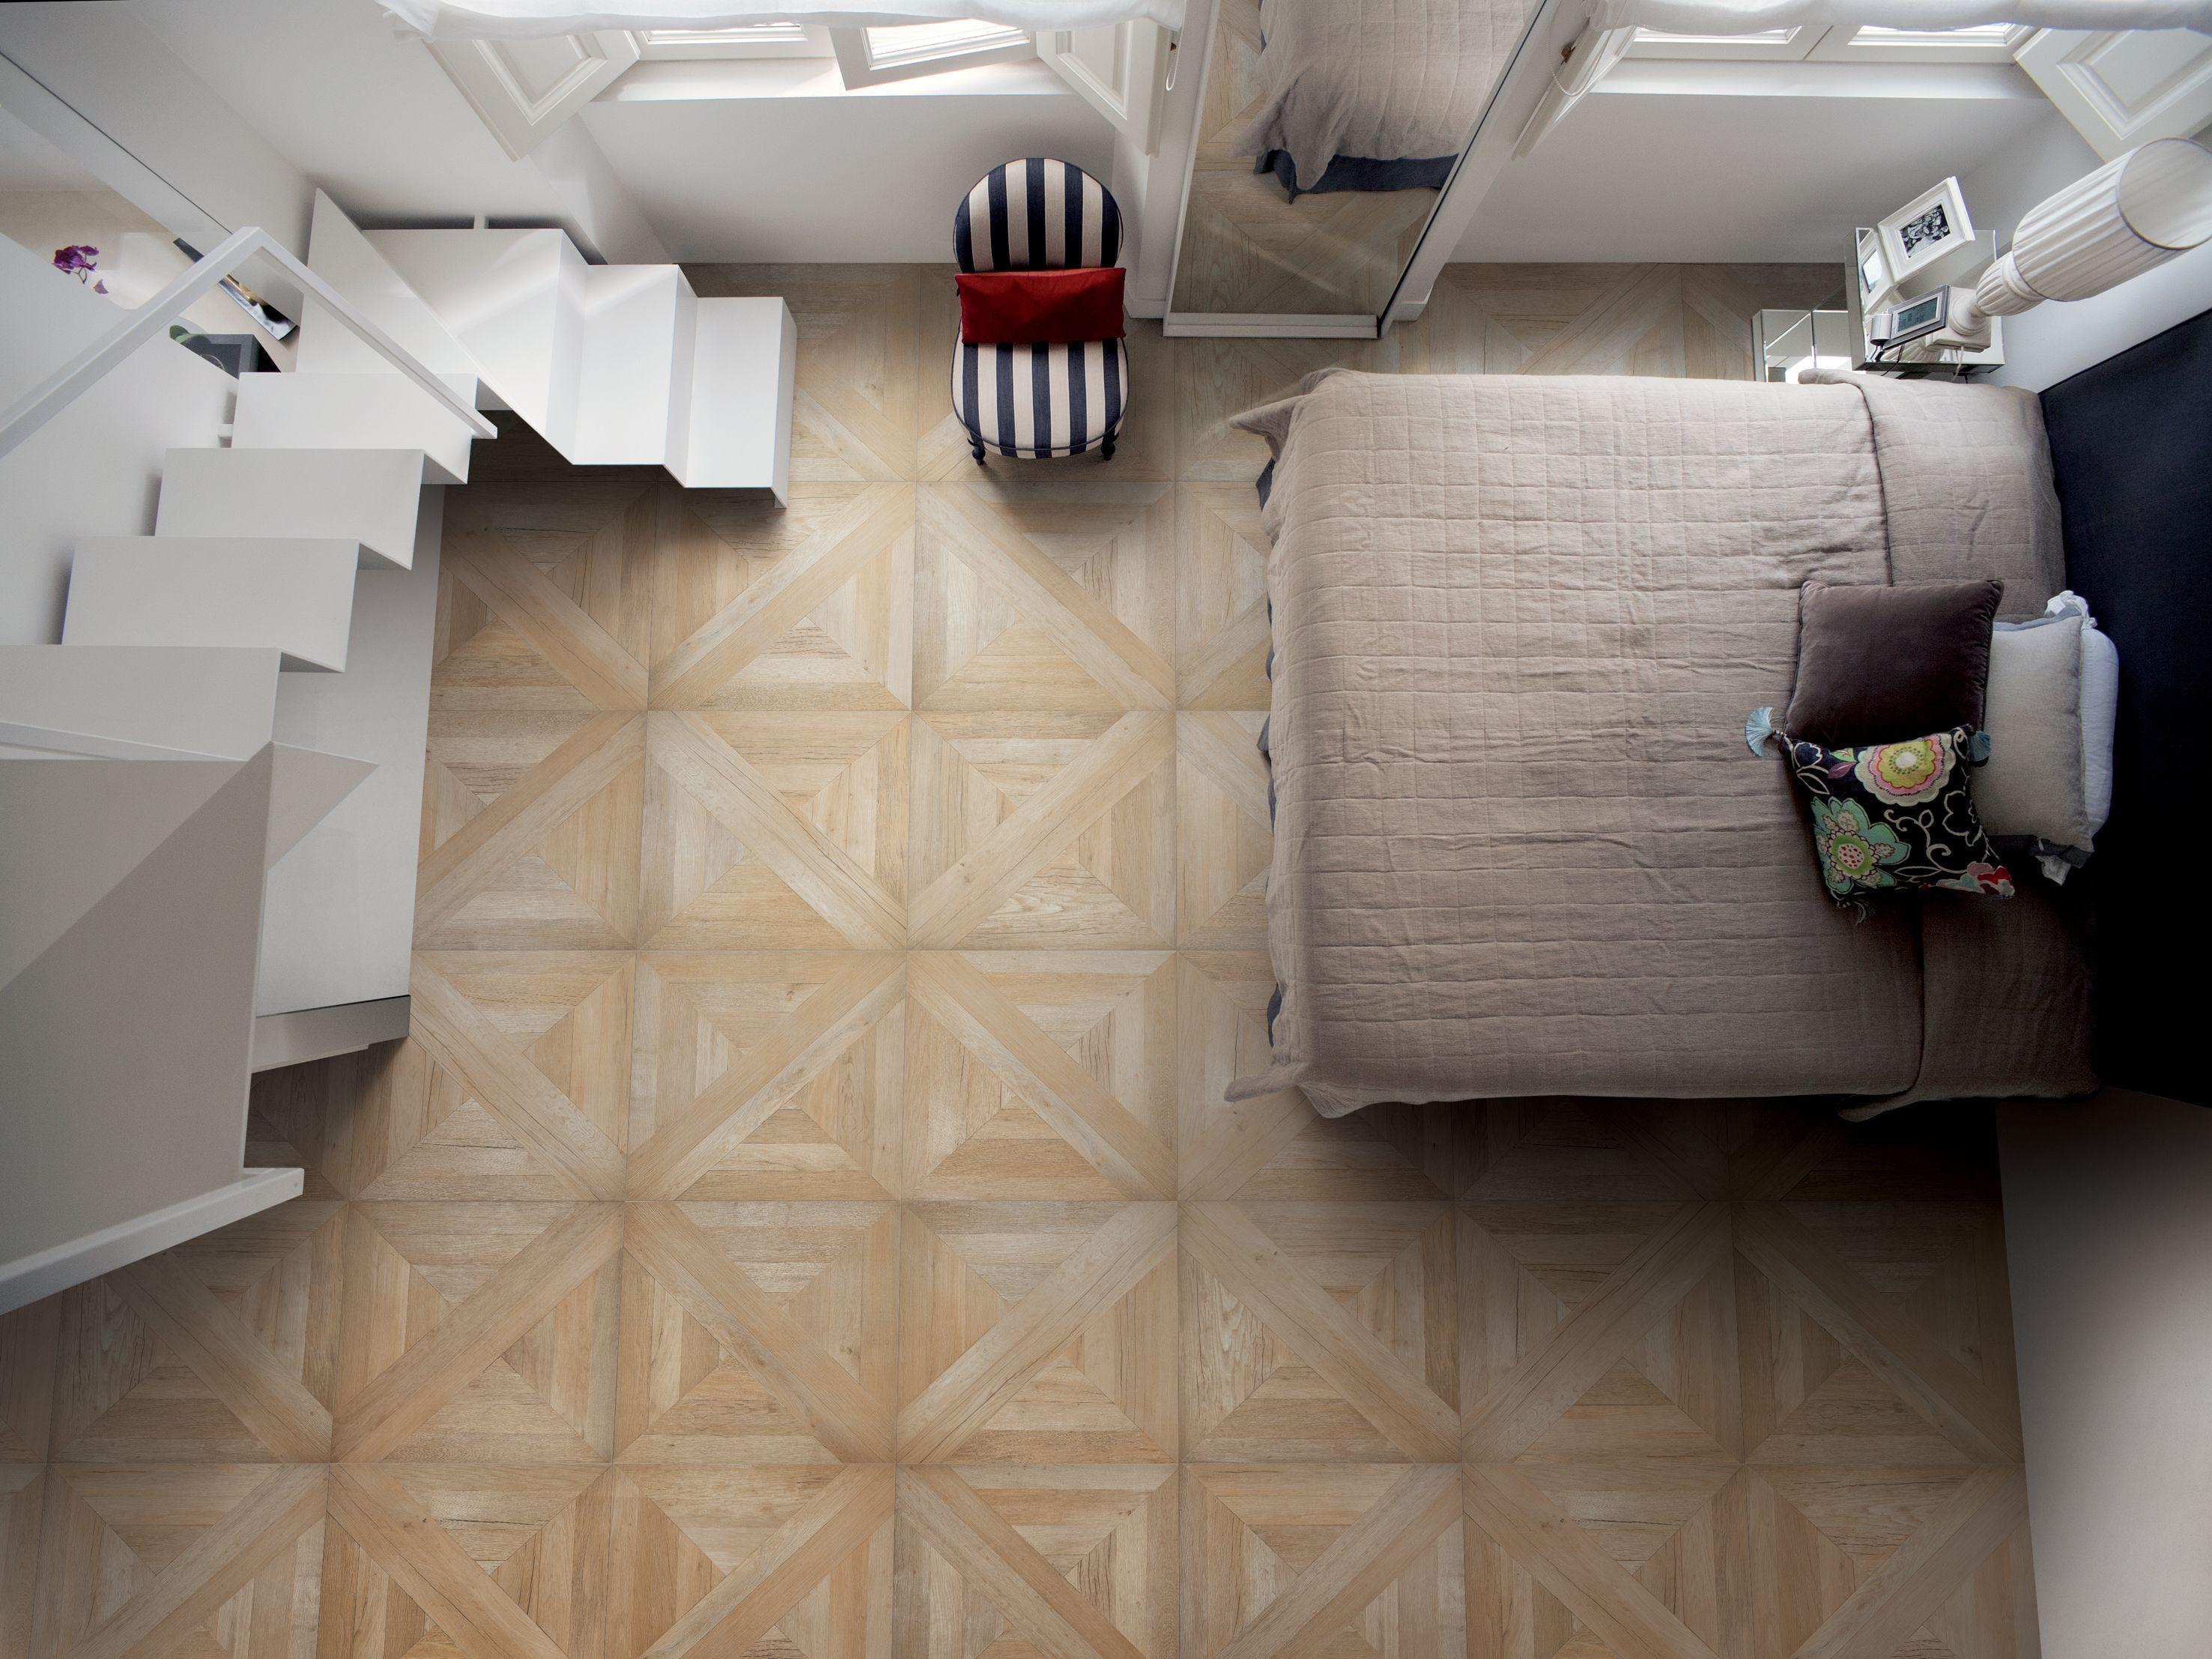 Tile in photo refin ceramiche mansion hall 75x75 refin mansion tile in photo refin ceramiche mansion hall 75x75 doublecrazyfo Choice Image